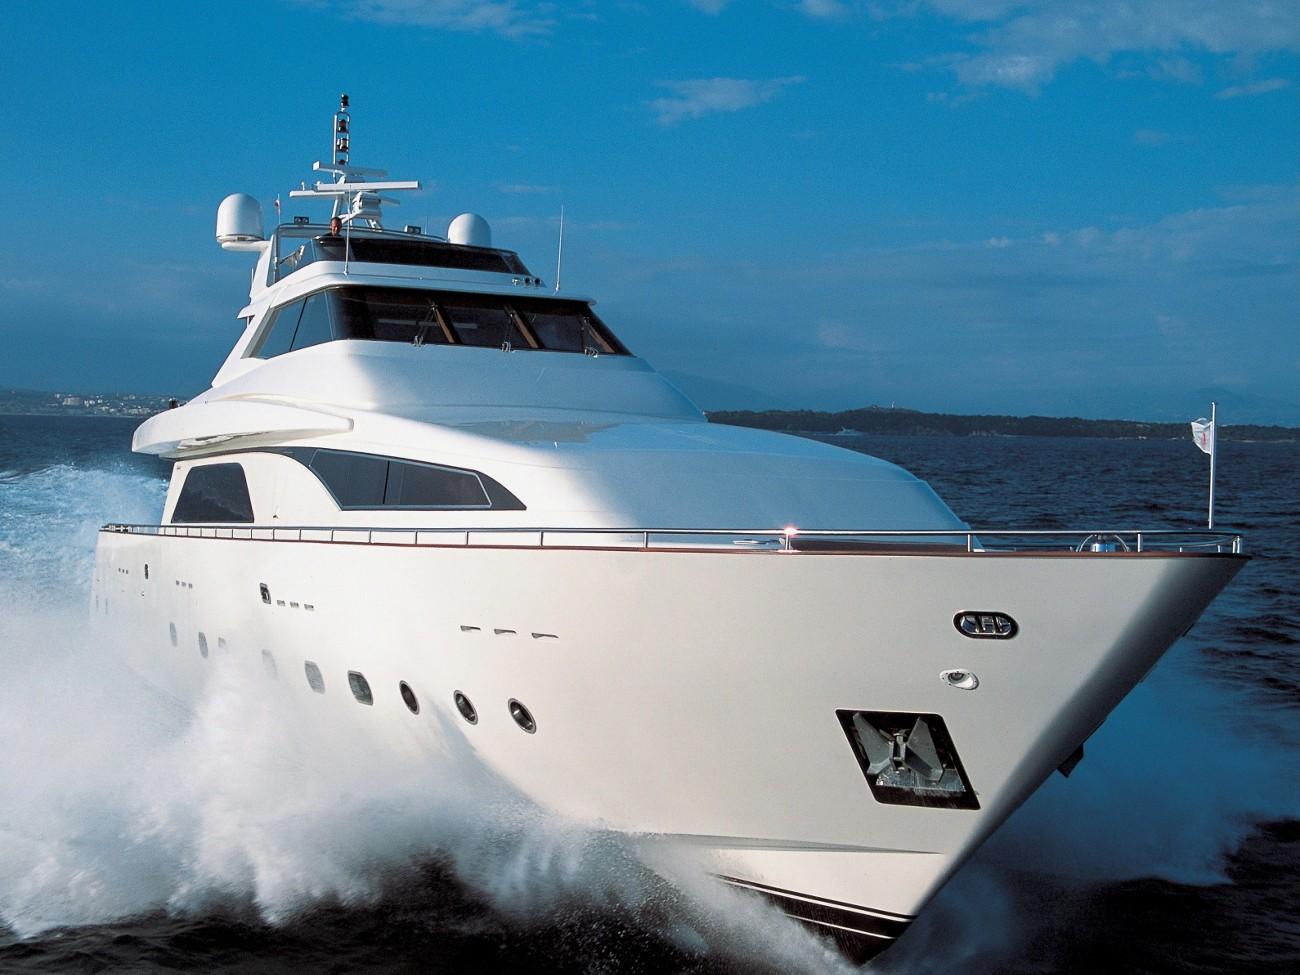 Ship's Bow: Yacht SHELEILA's Cruising Image